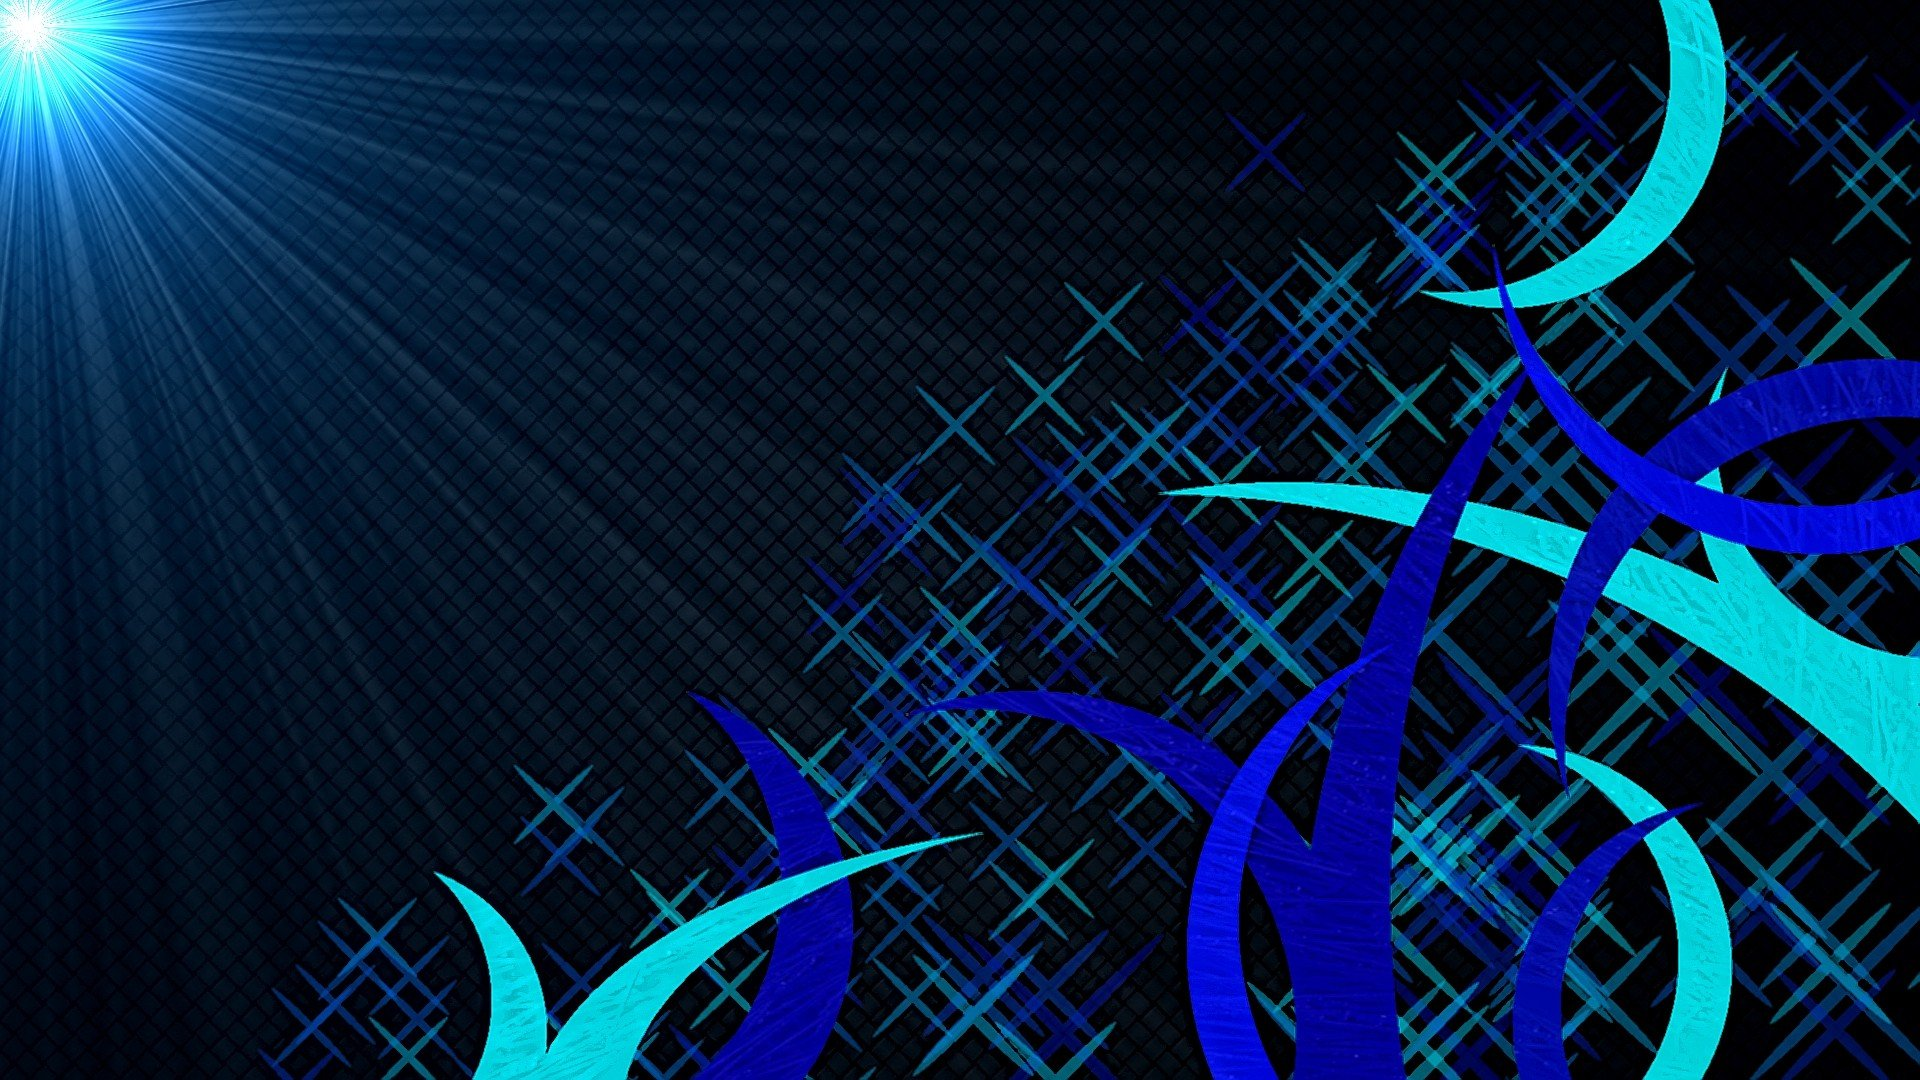 D art wallpapers digital fantasy artist free desktop background